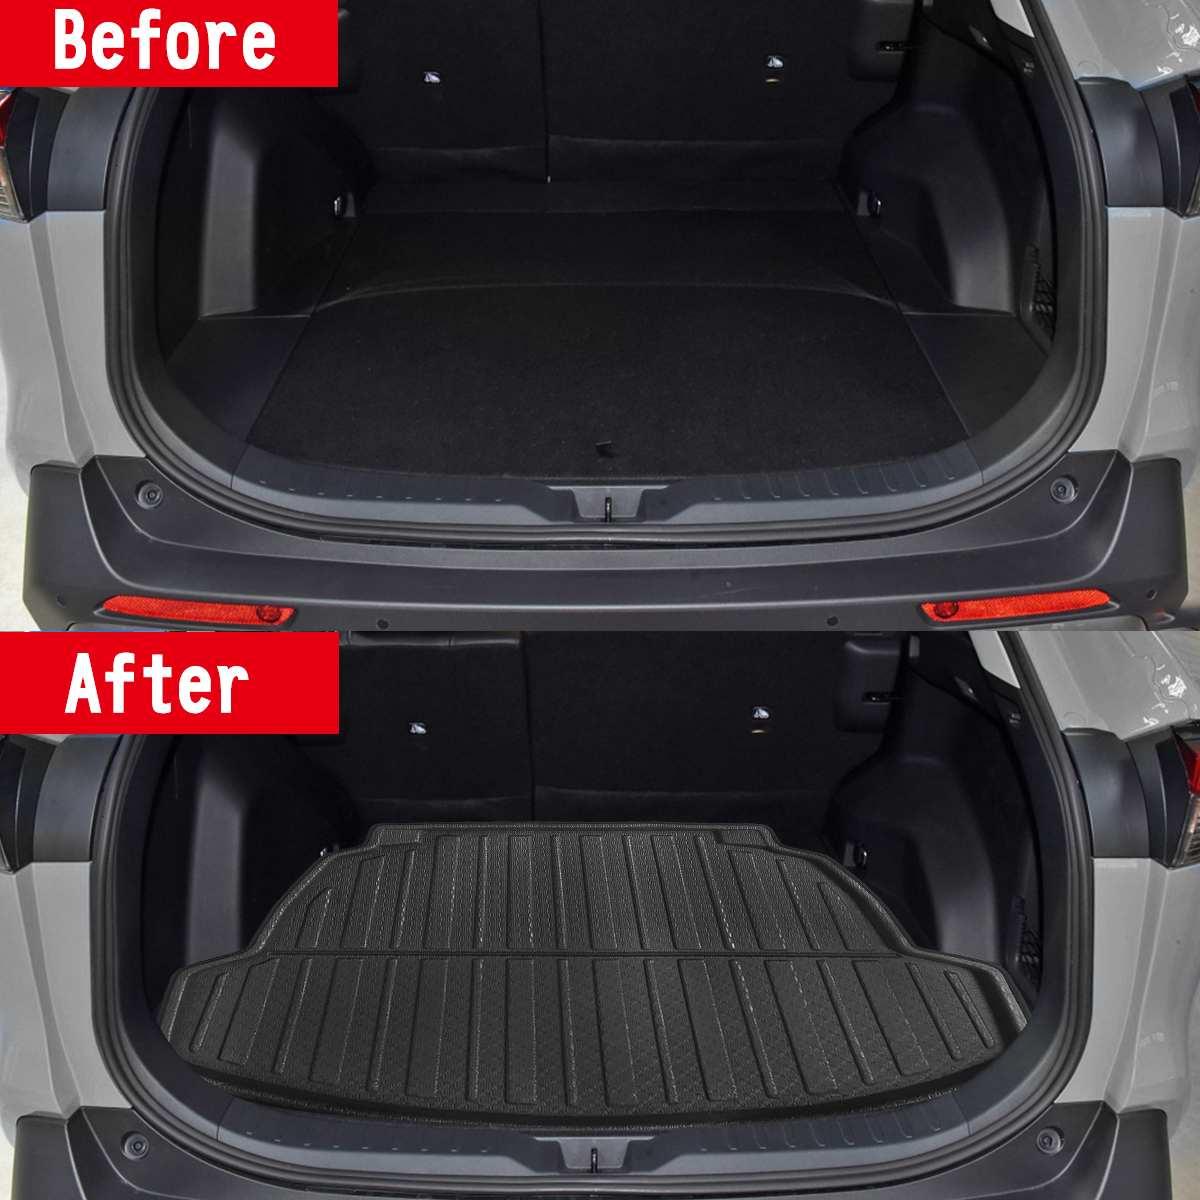 Car Cargo Liner Boot Tray Rear Trunk Cover Matt Mat Floor Carpet Kick Pad For Toyota For Carola Corolla Sedan models 2019|  - title=